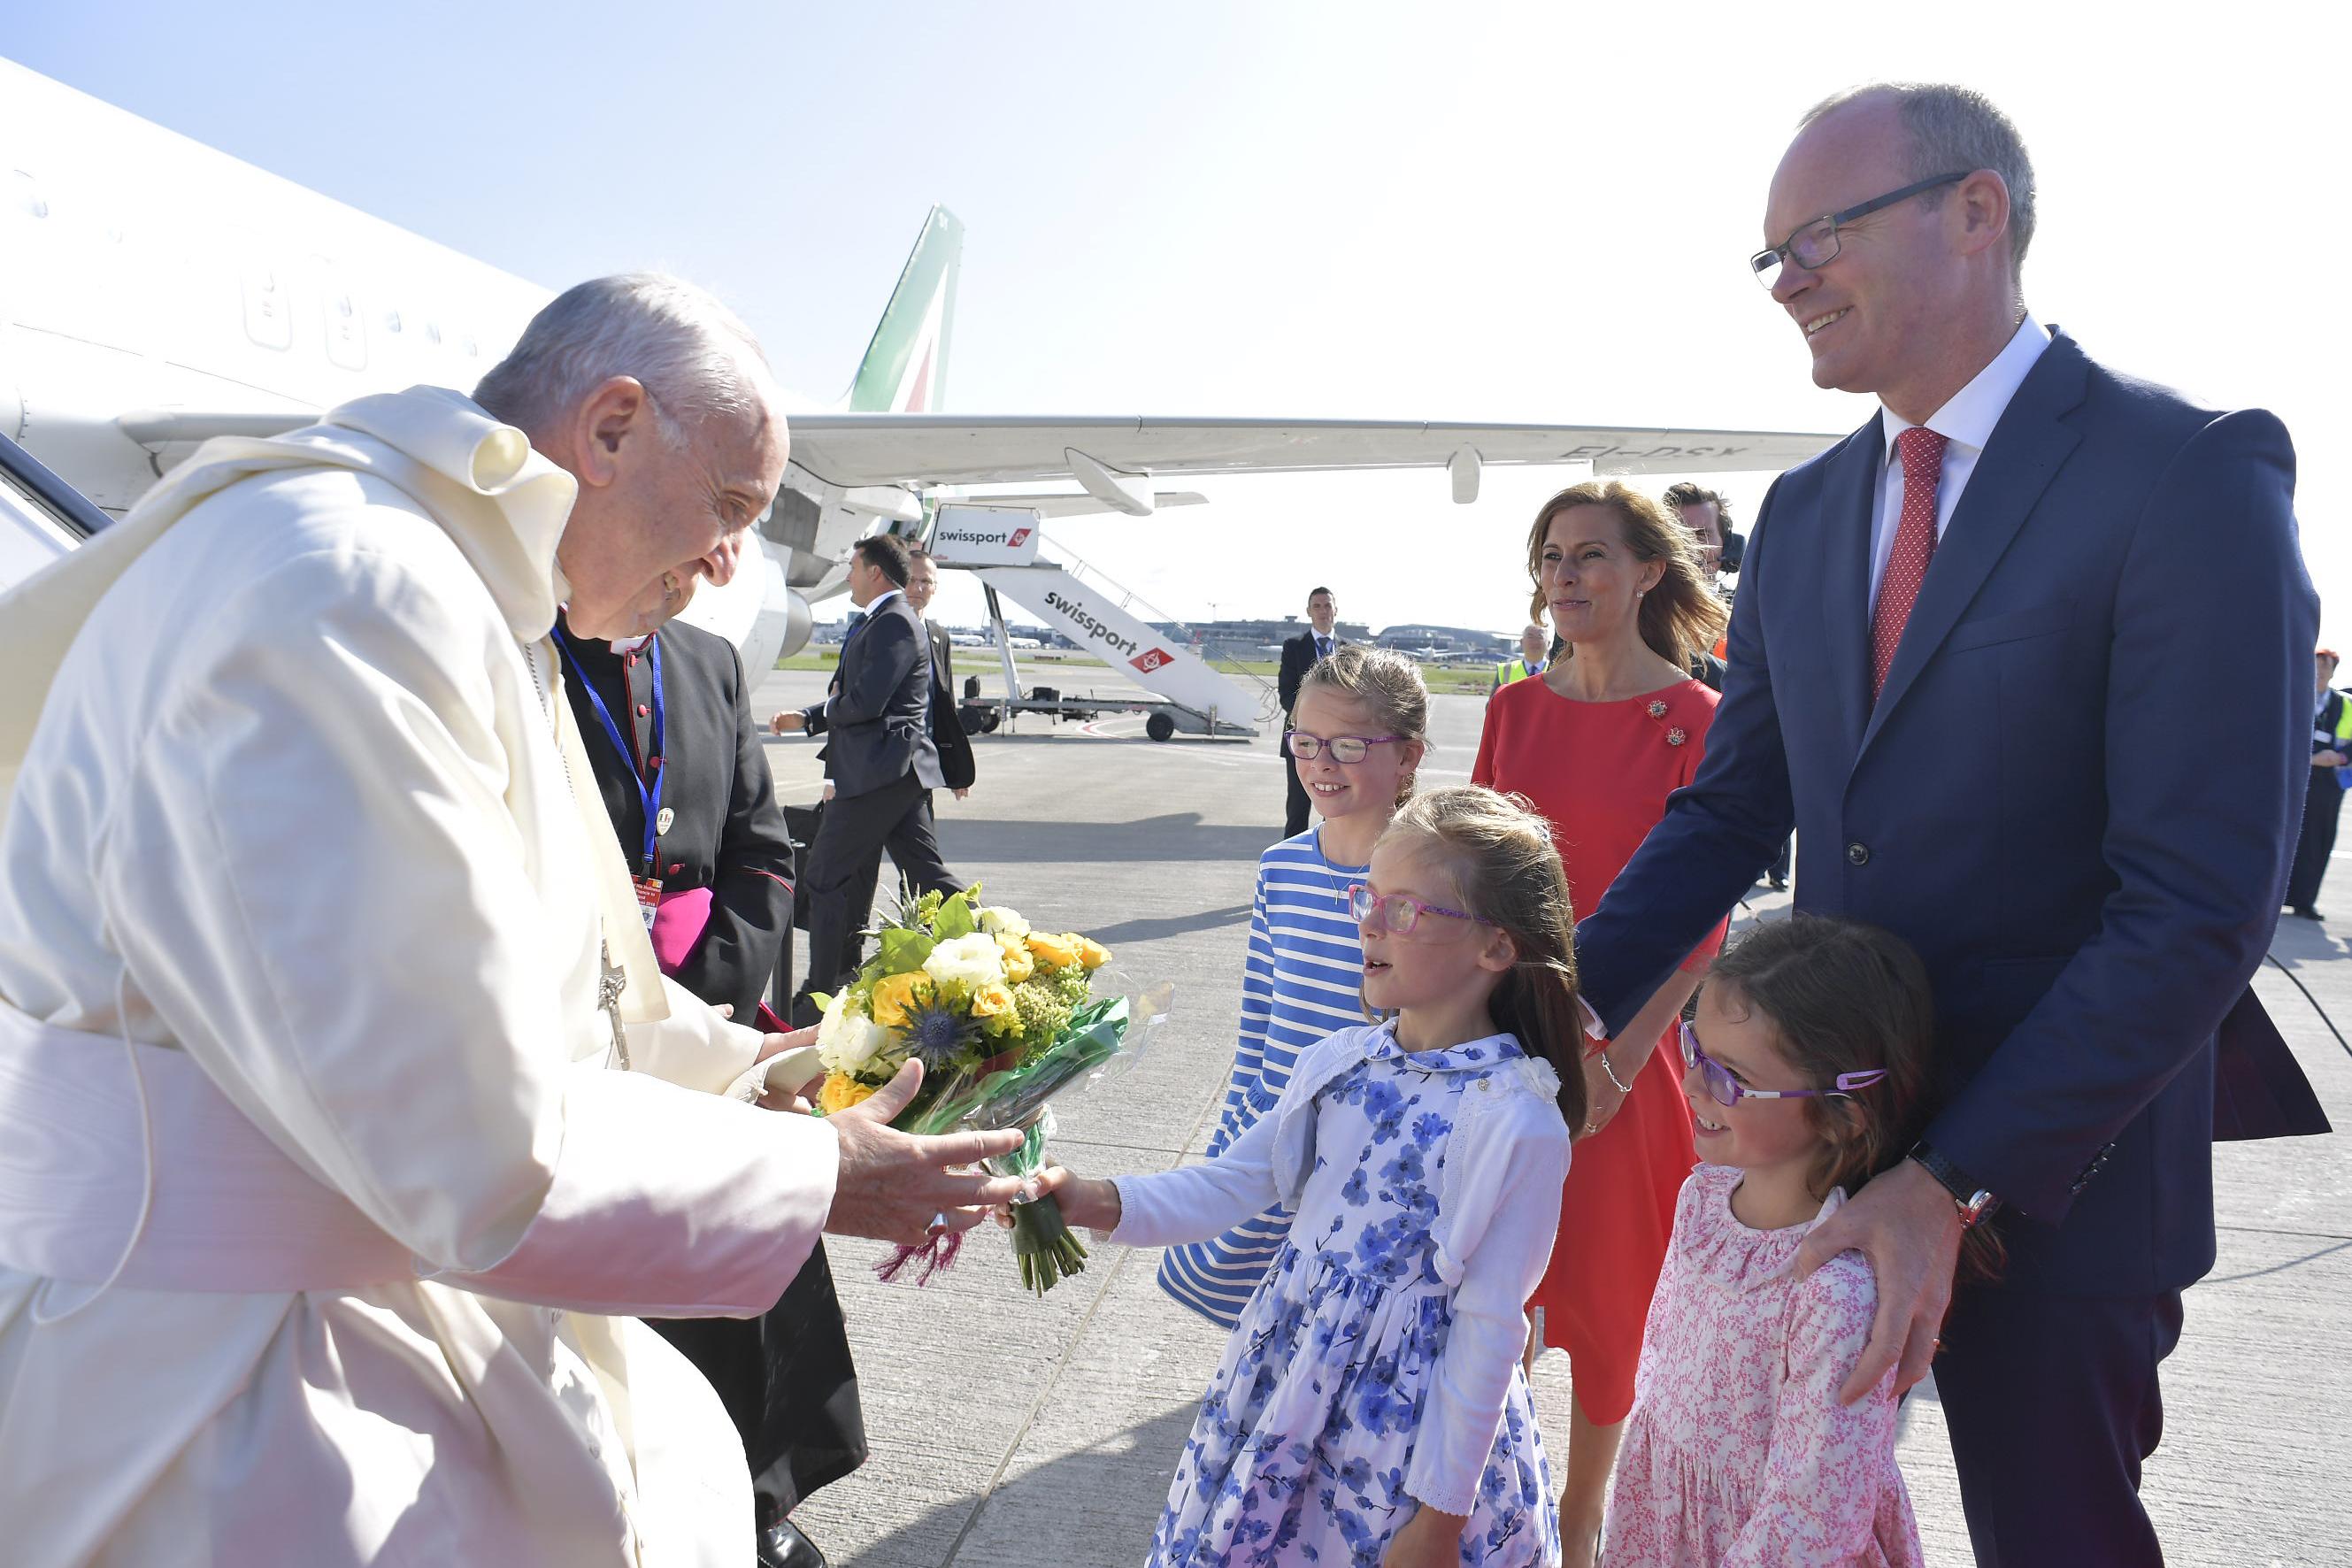 POPE FRANCIS,DUBLIN,AIRPORT,MMWMOF